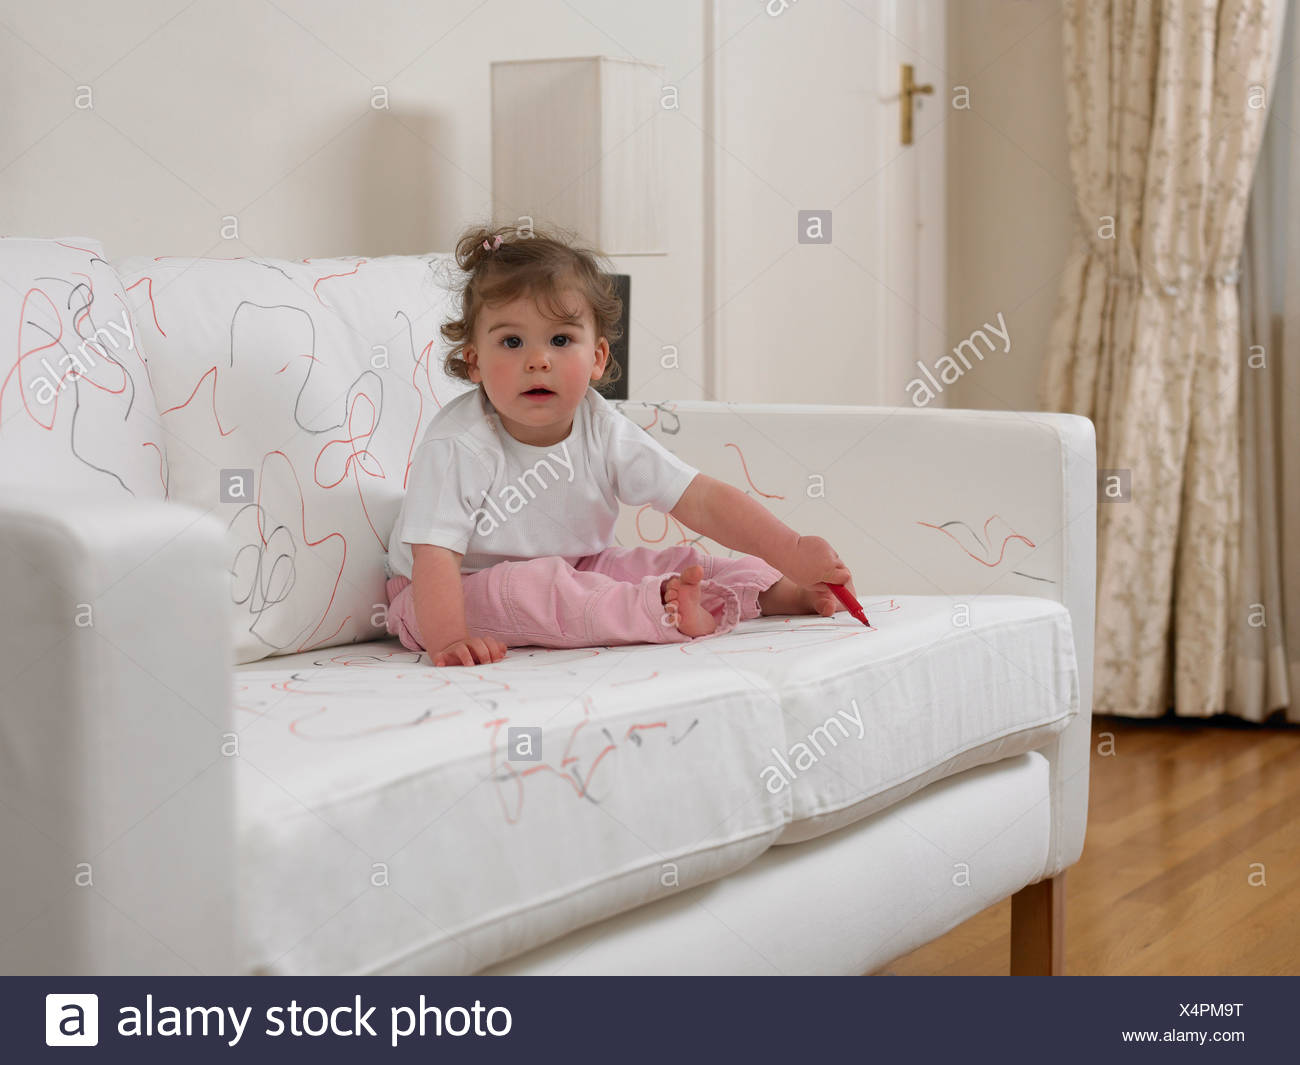 Baby girl using marker on sofa - Stock Image